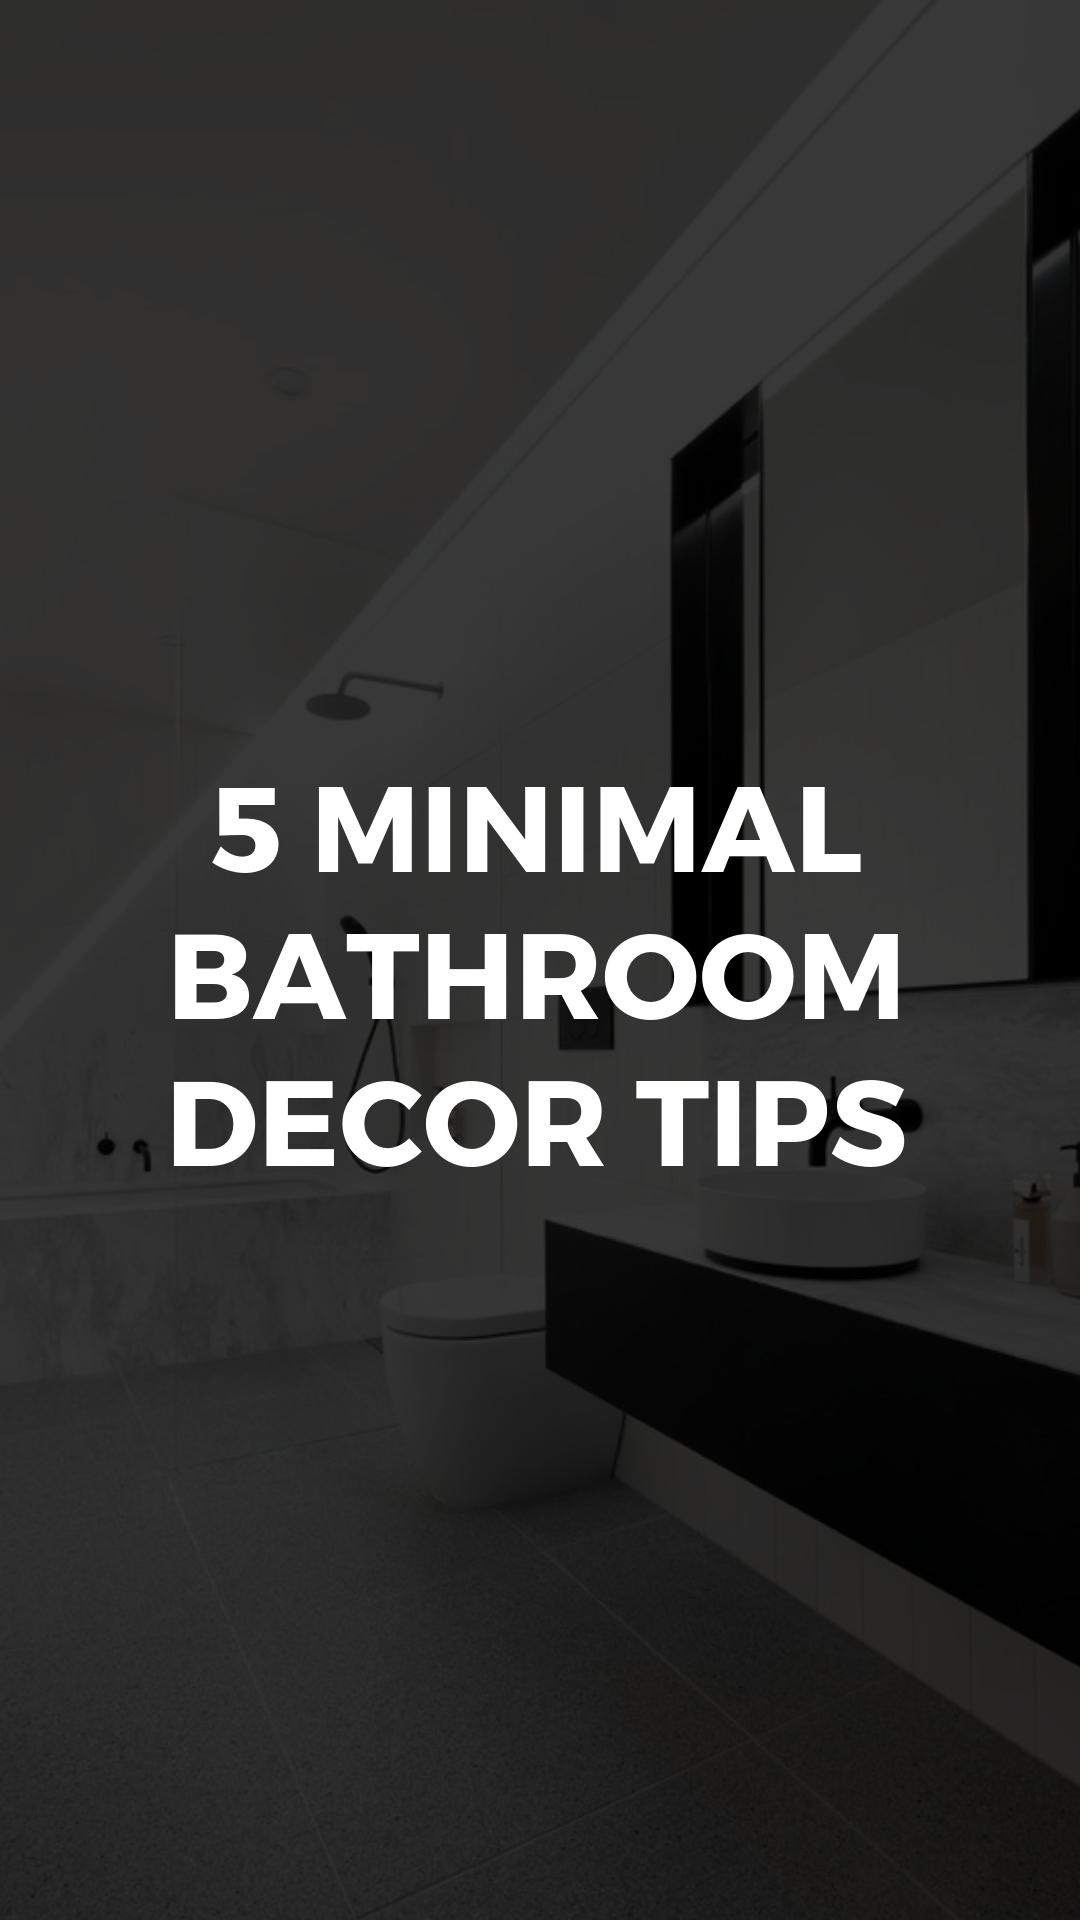 Minimal bathroom decor tips.jpg